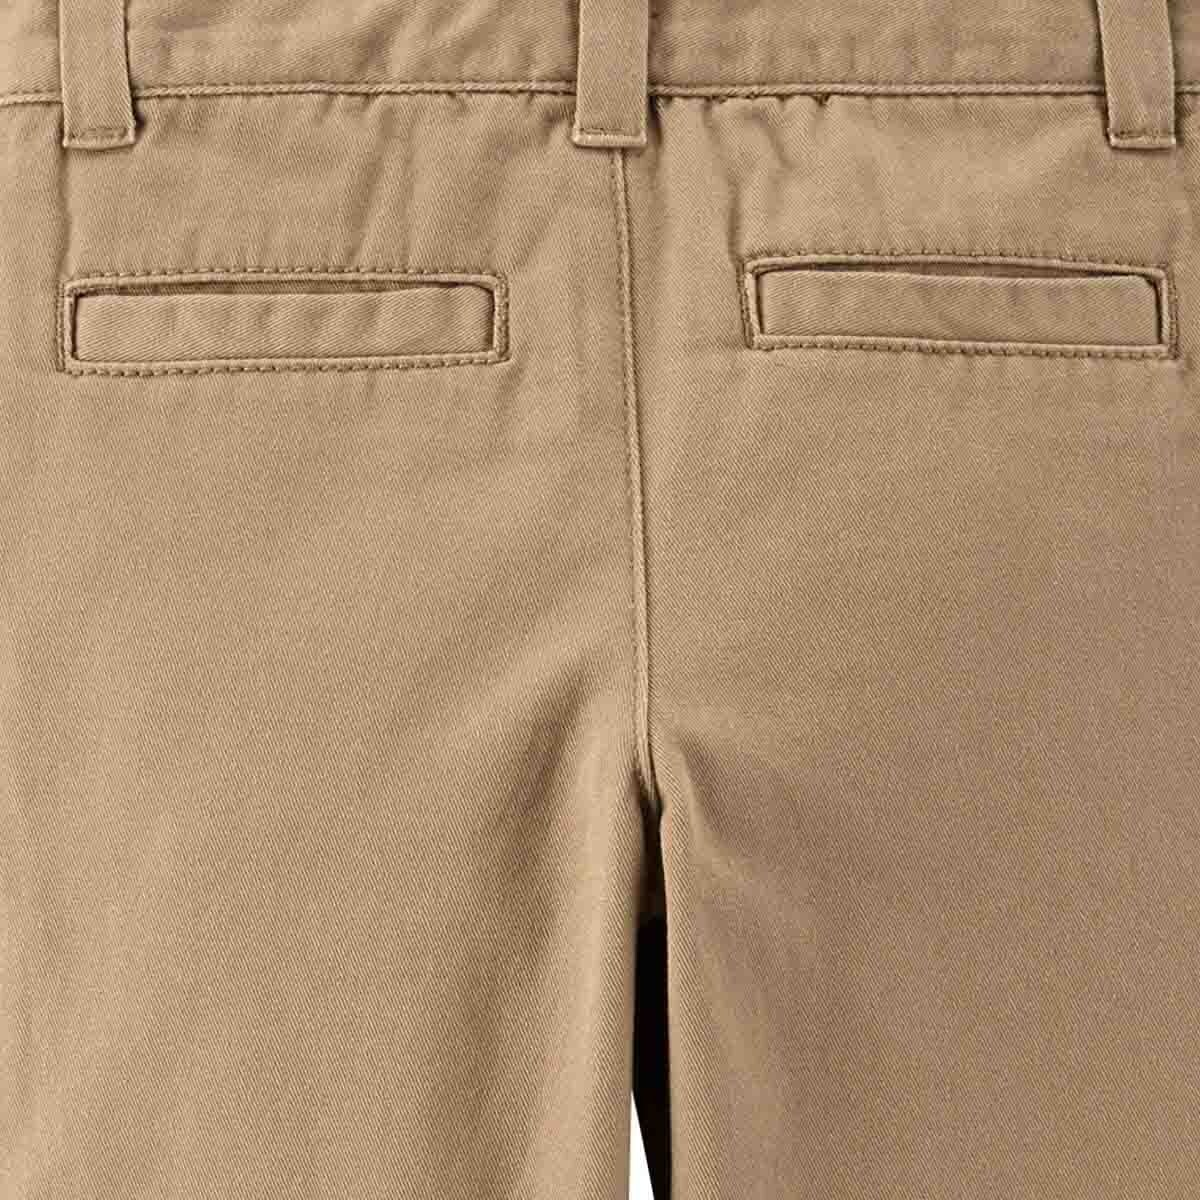 Pantalón Color Khaki Carters